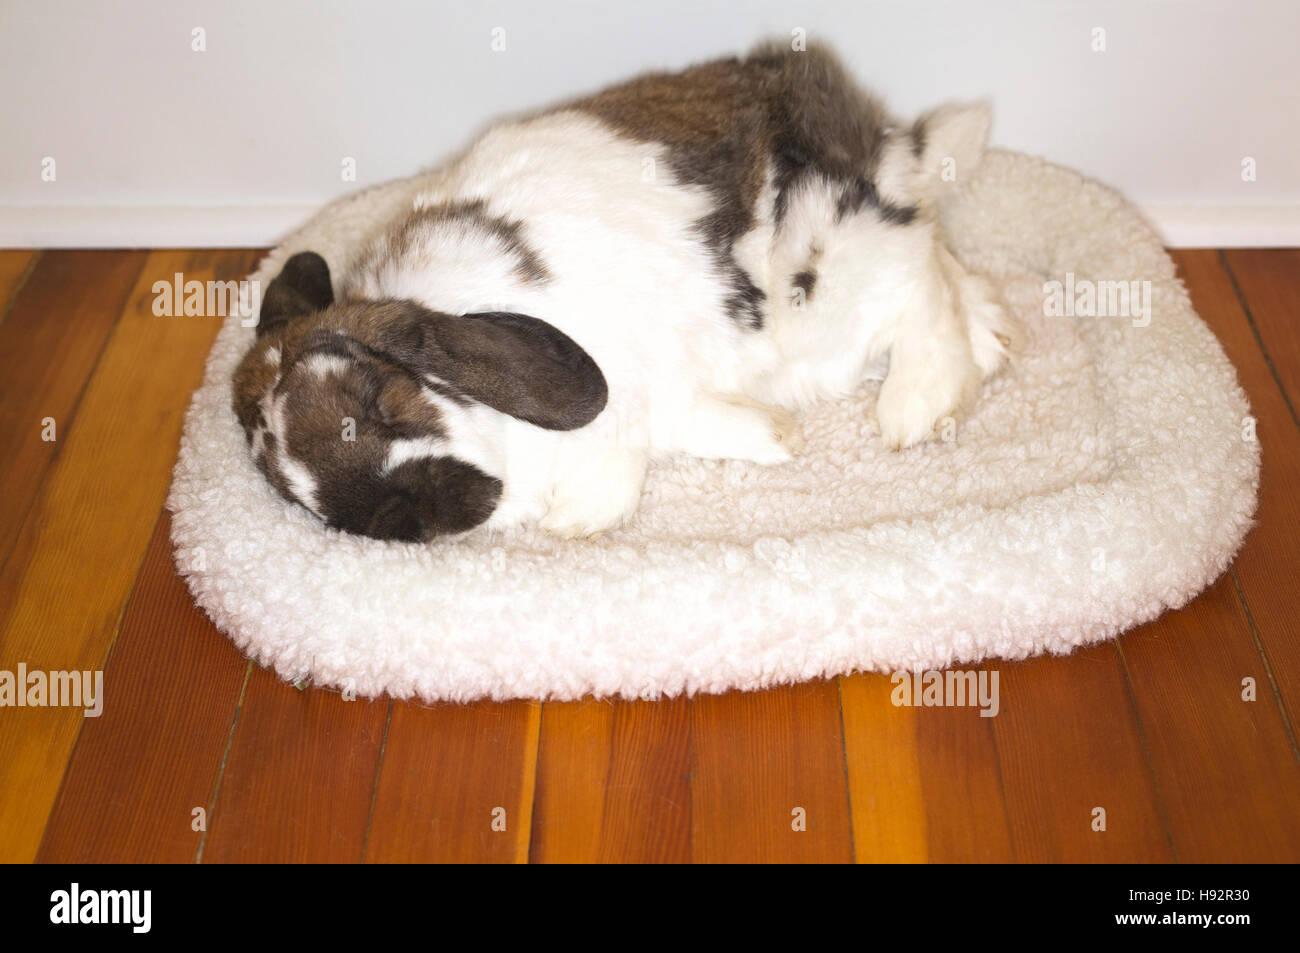 Nine-year old pet Holland Lop dwarf rabbit sleeping on fleece bed inside house - Stock Image